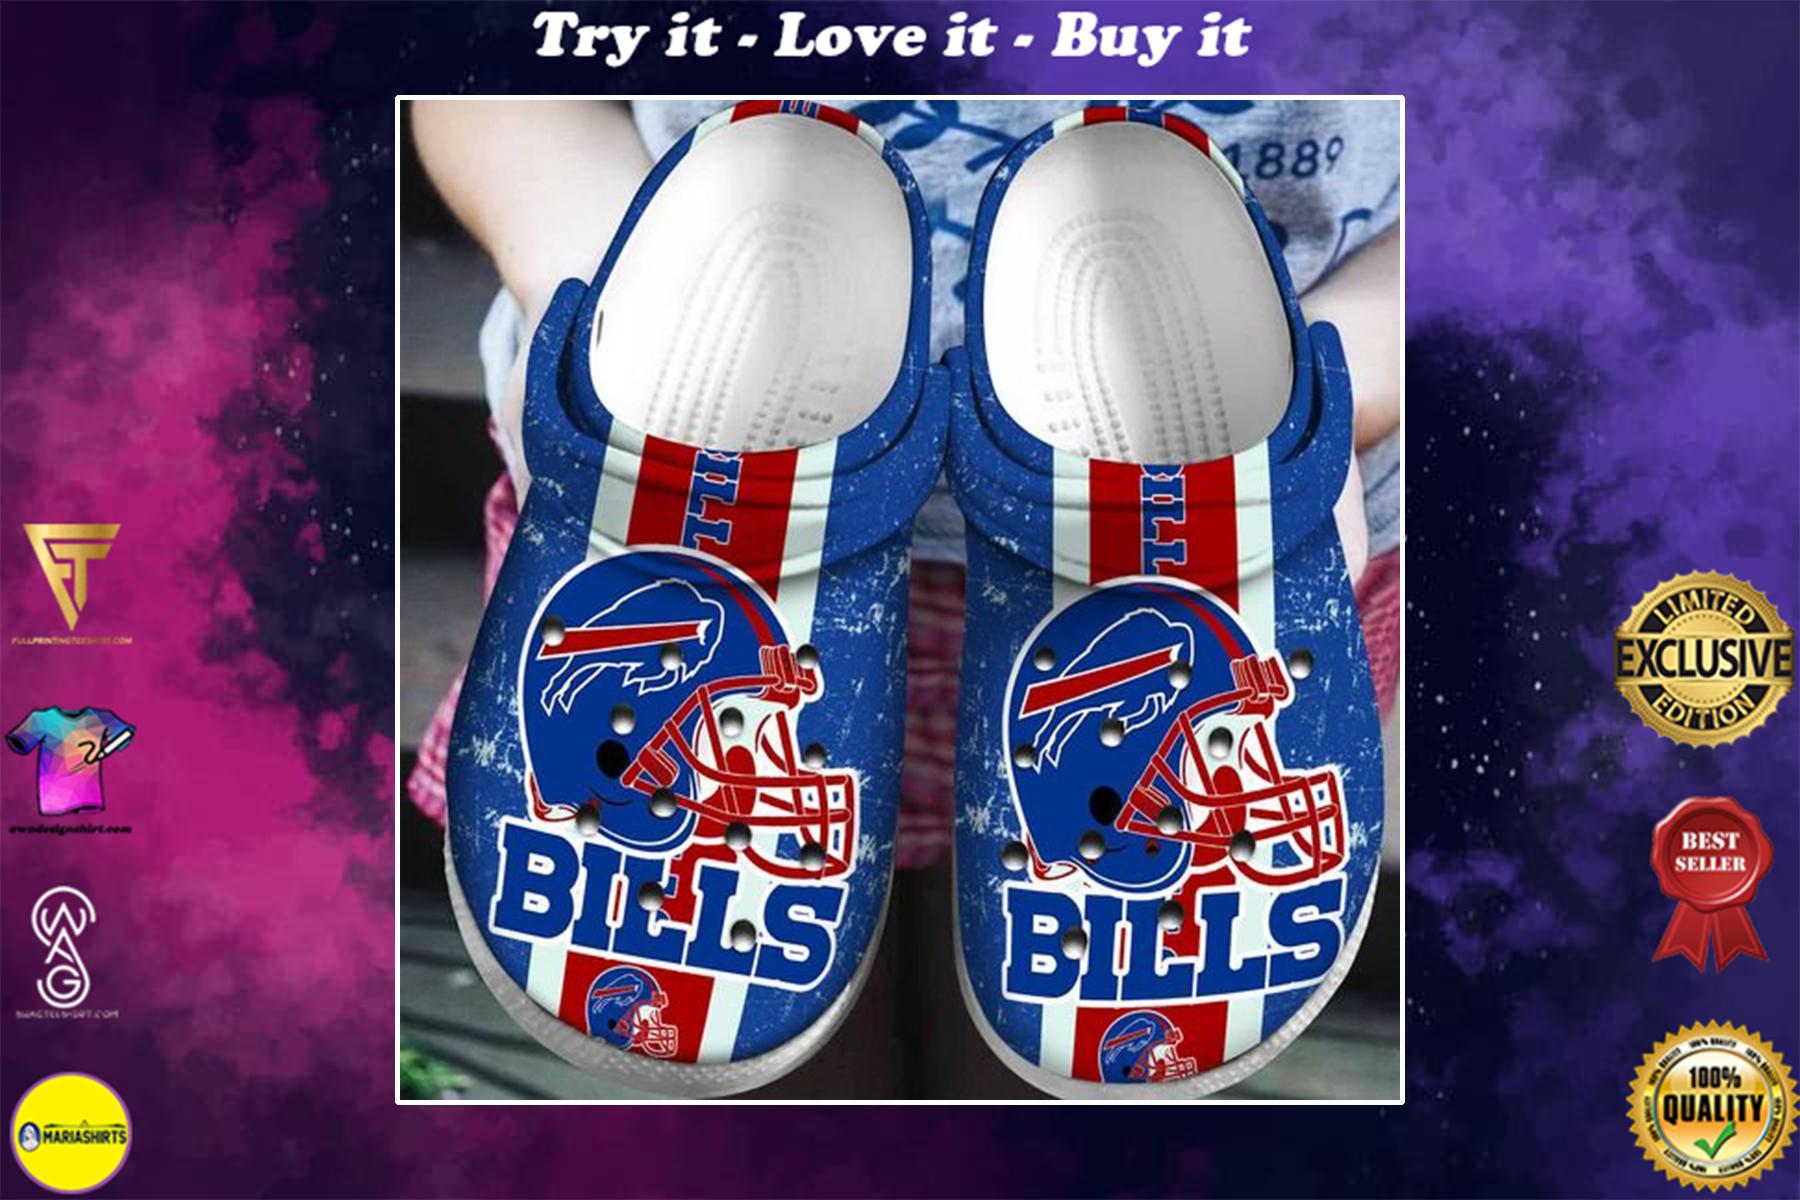 [special edition] crocs buffalo bills football clog - maria